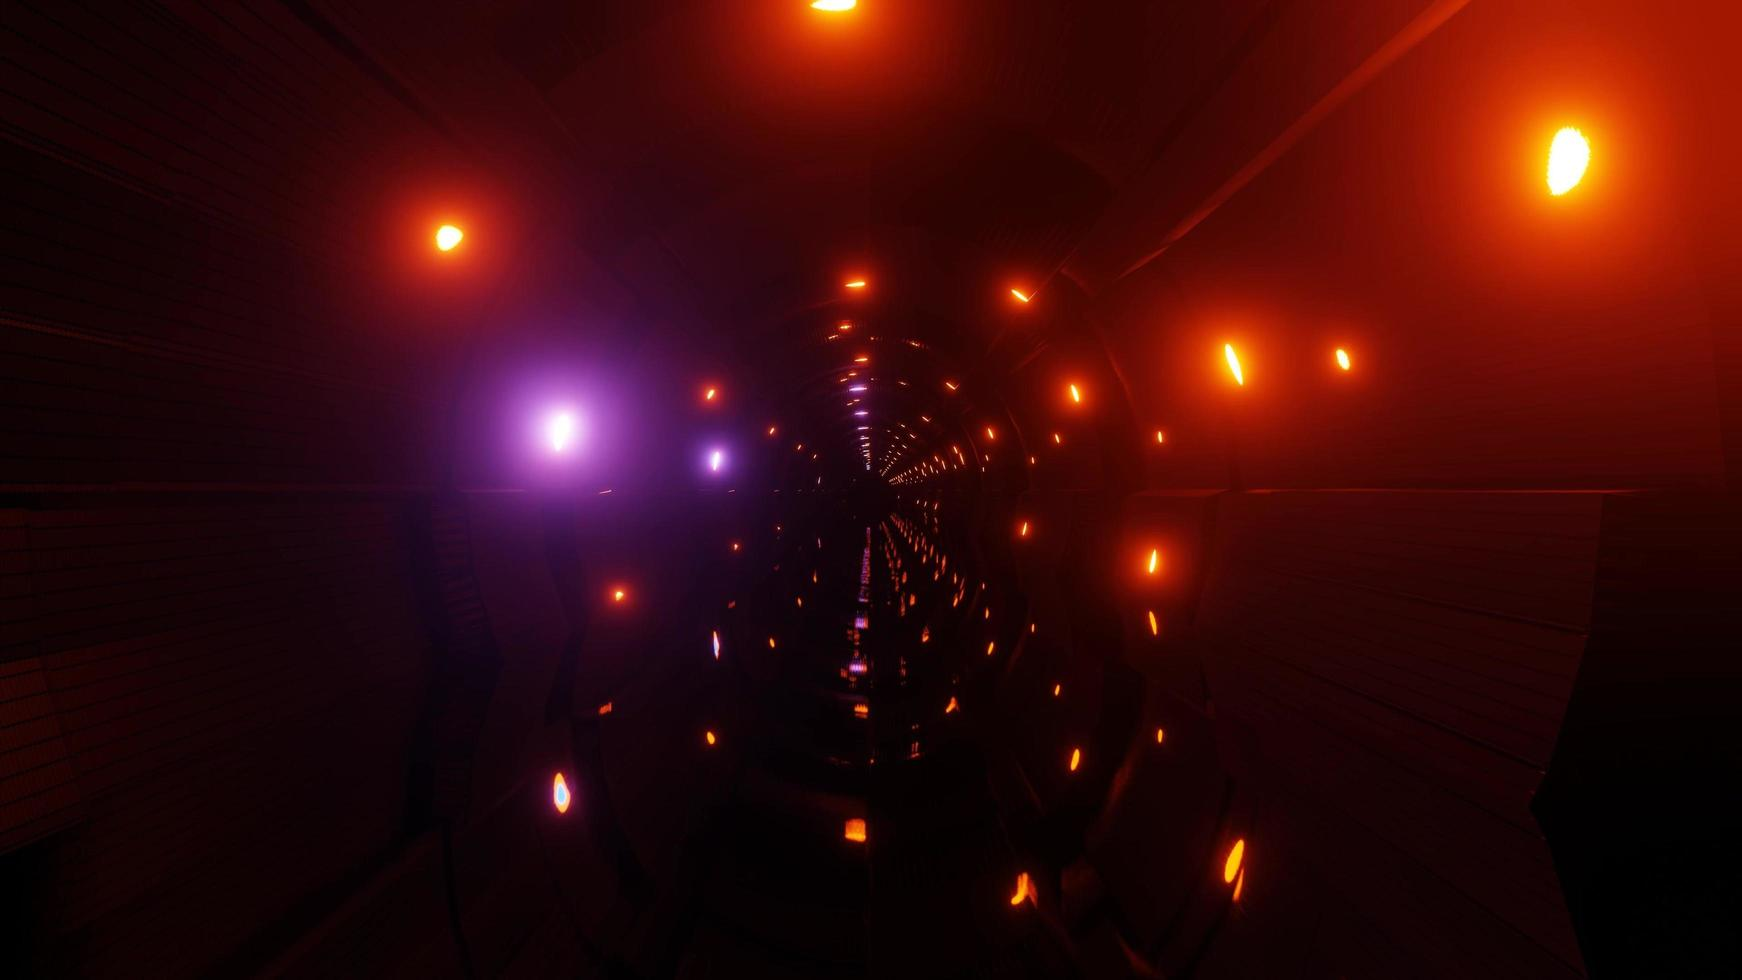 Moving lights on sci fi tunnel 3d illustration photo